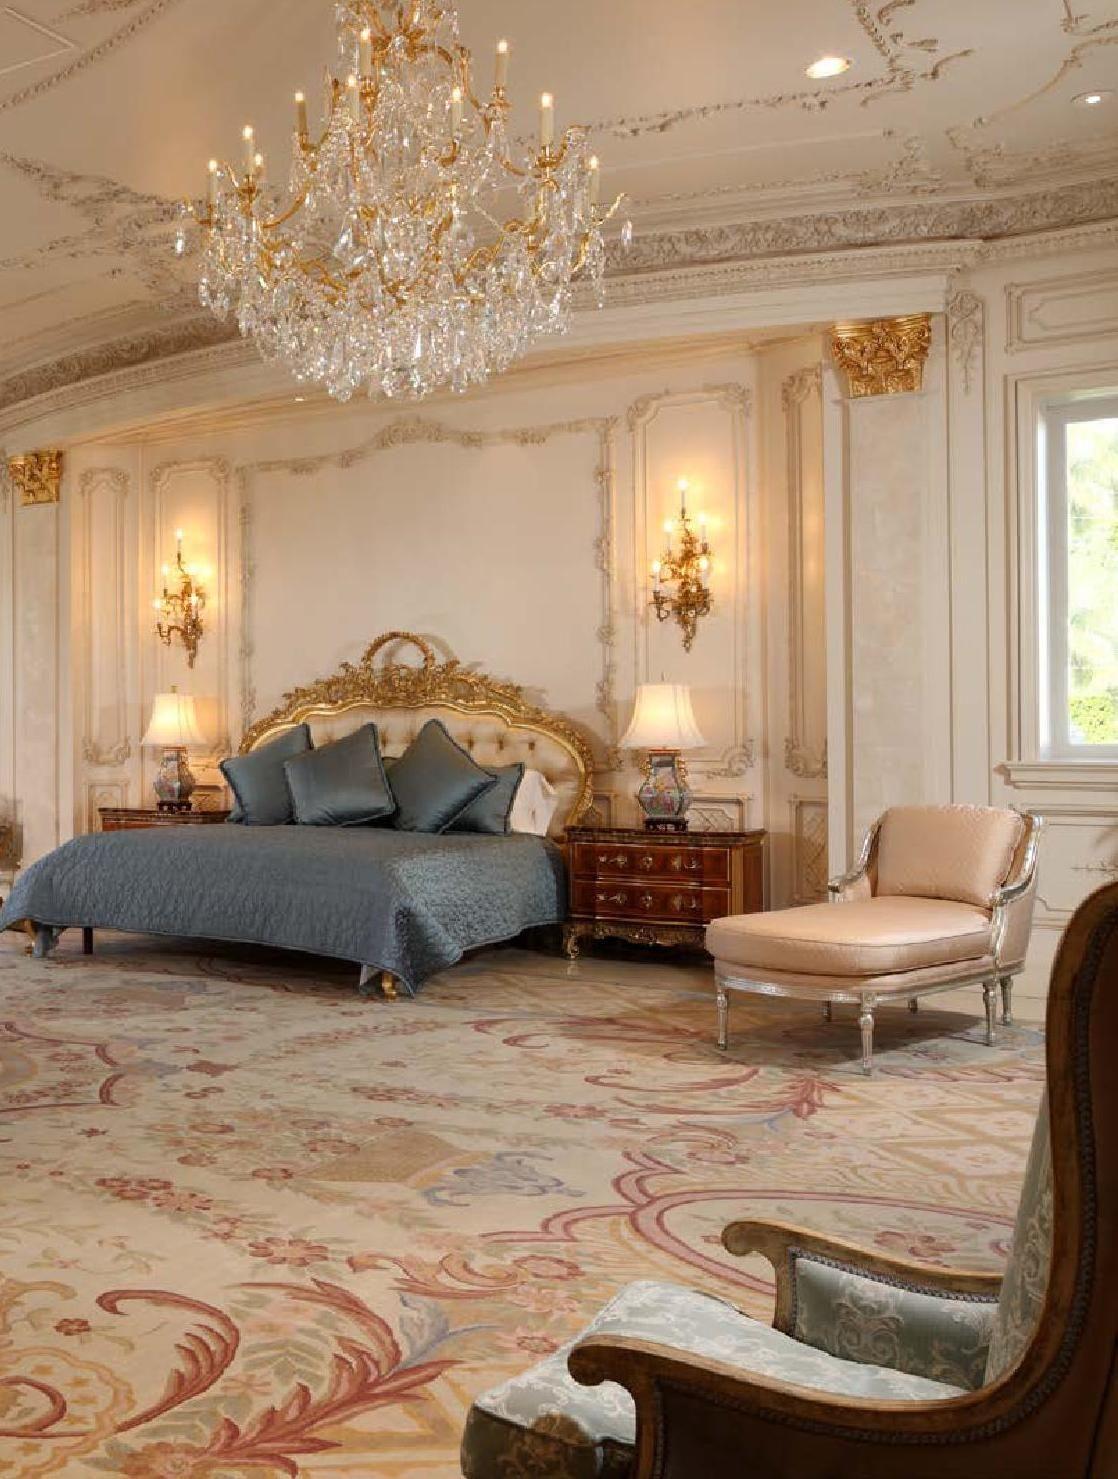 European Neo Classical Style Ii Bedroom Design Home Decor Bedroom Interior